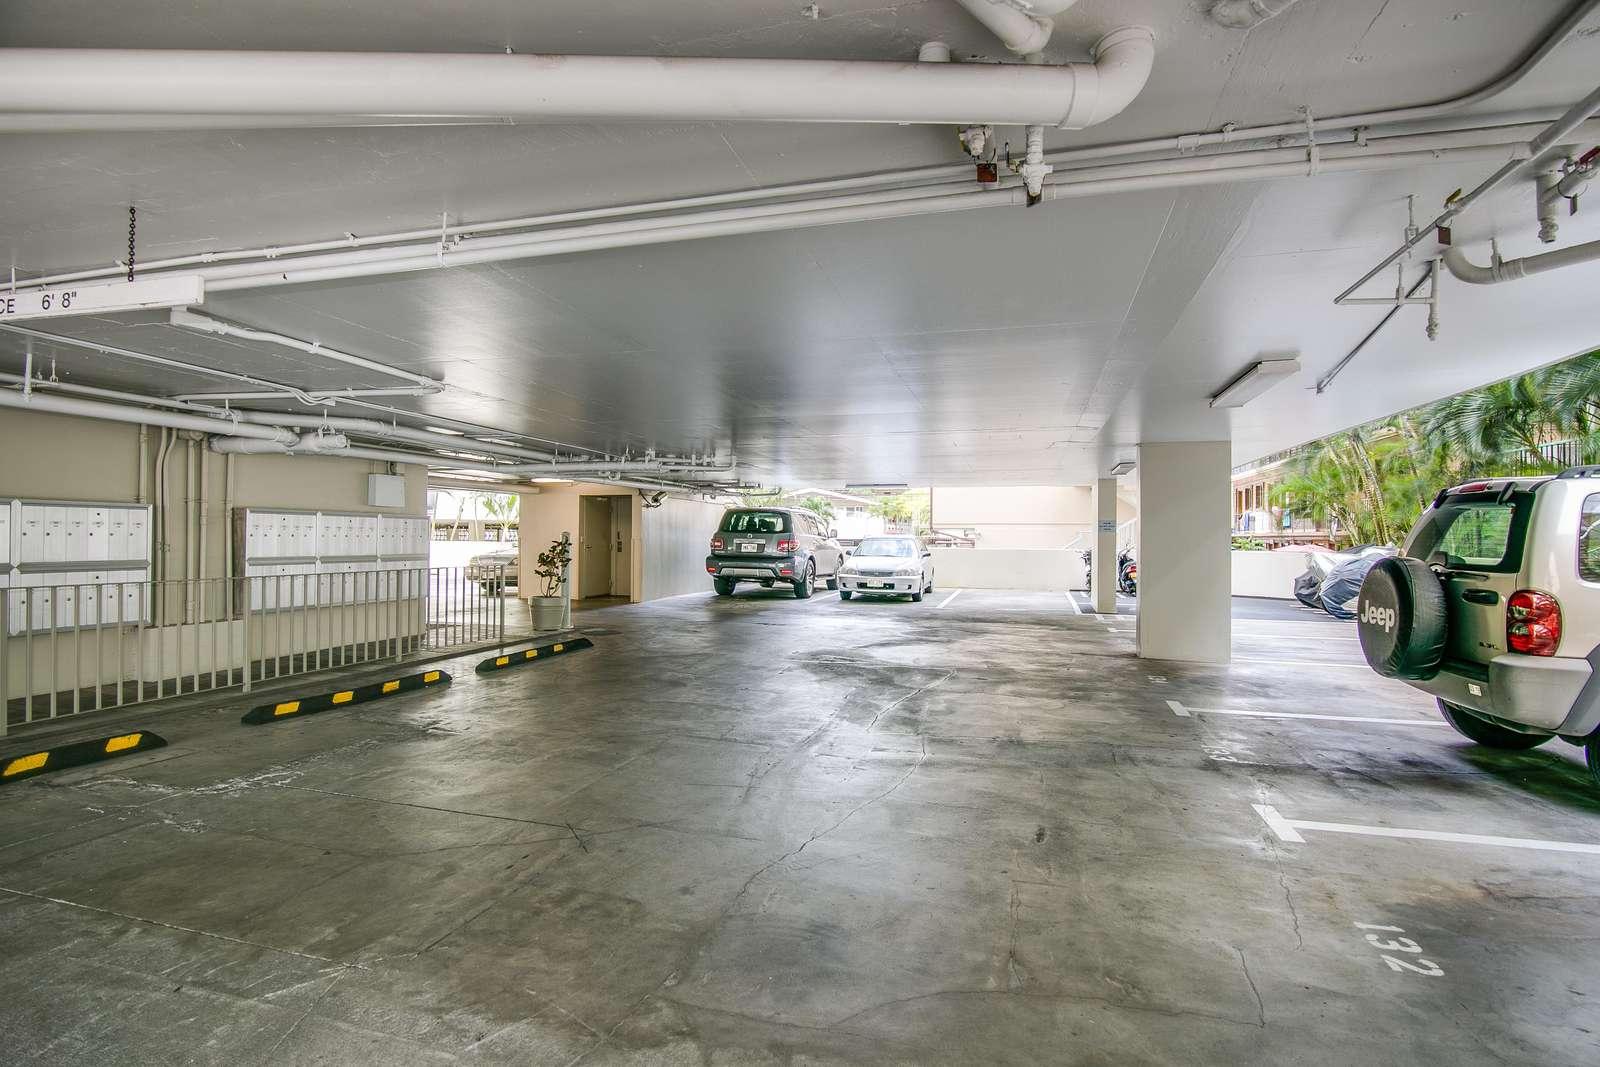 Large secure parking garage on two levels